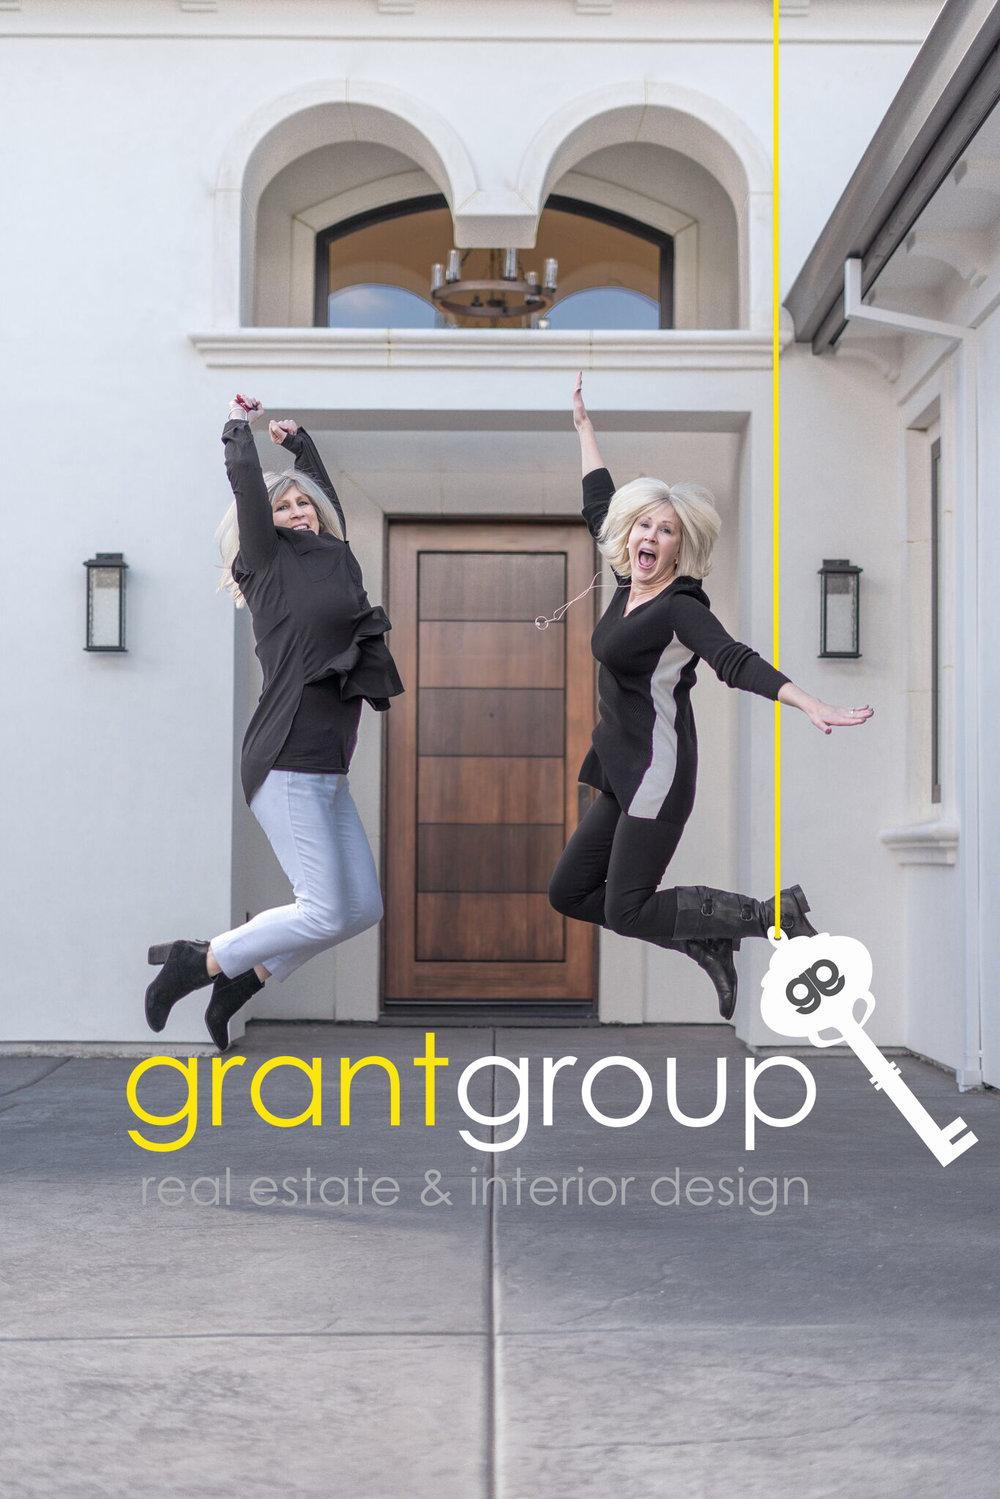 grant group fun.jpg